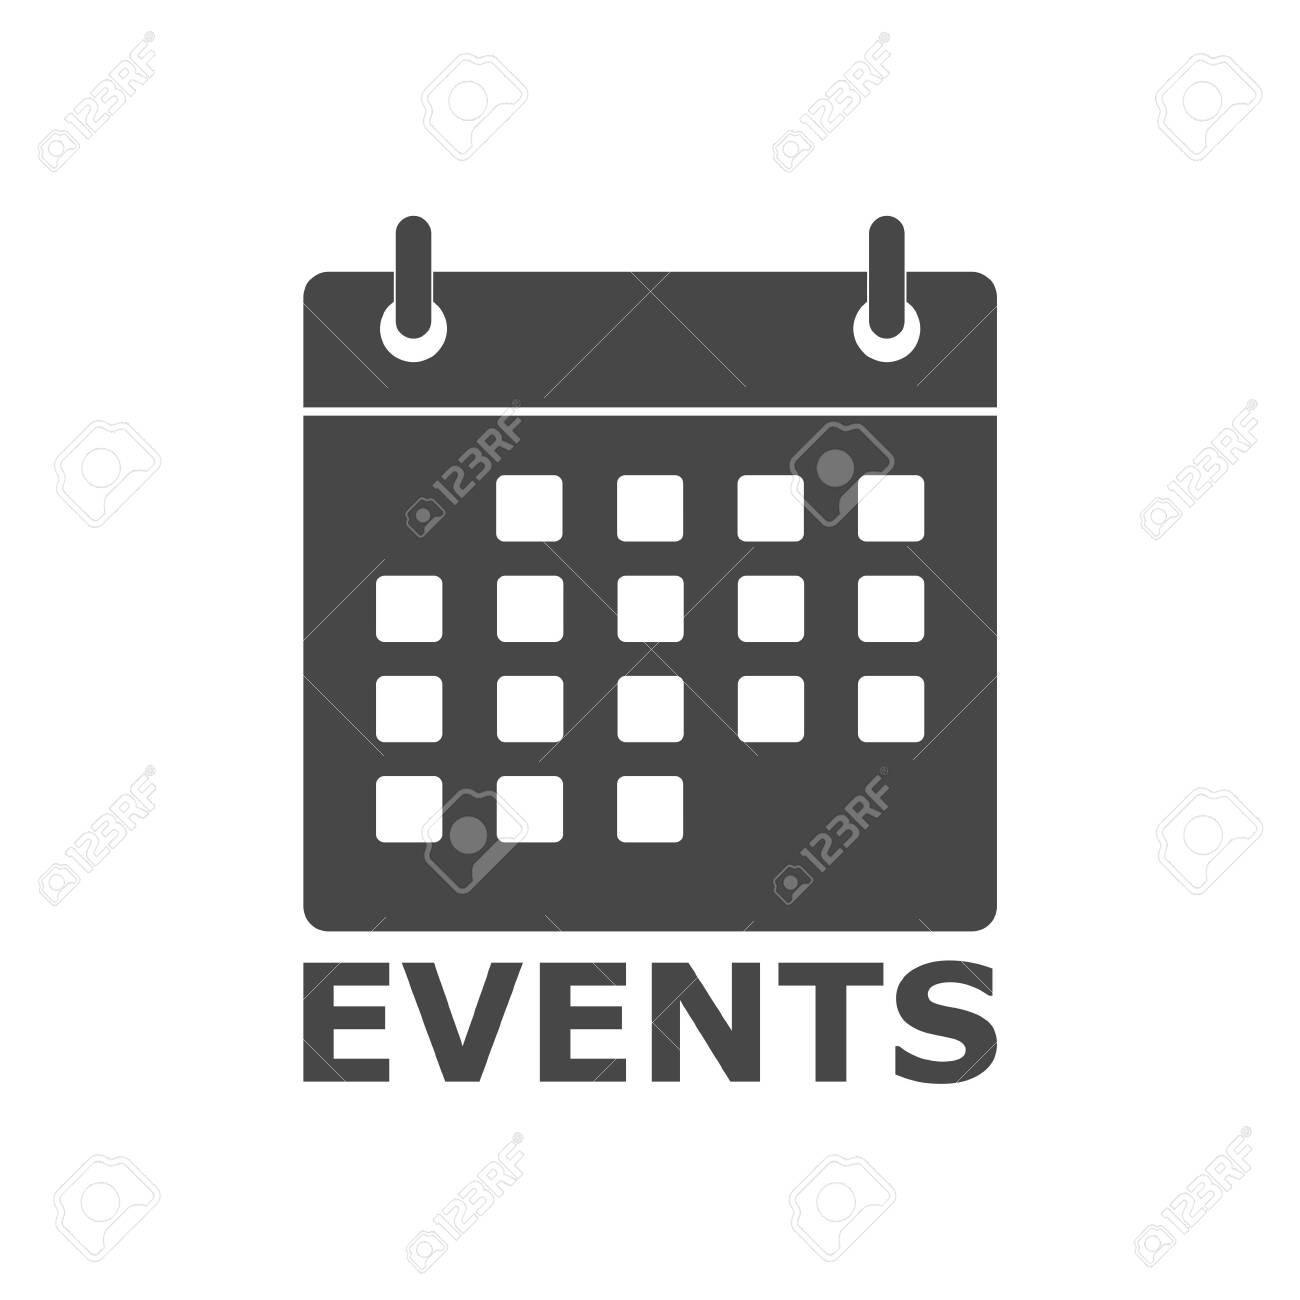 Events icon (calendar icon) - 138278979